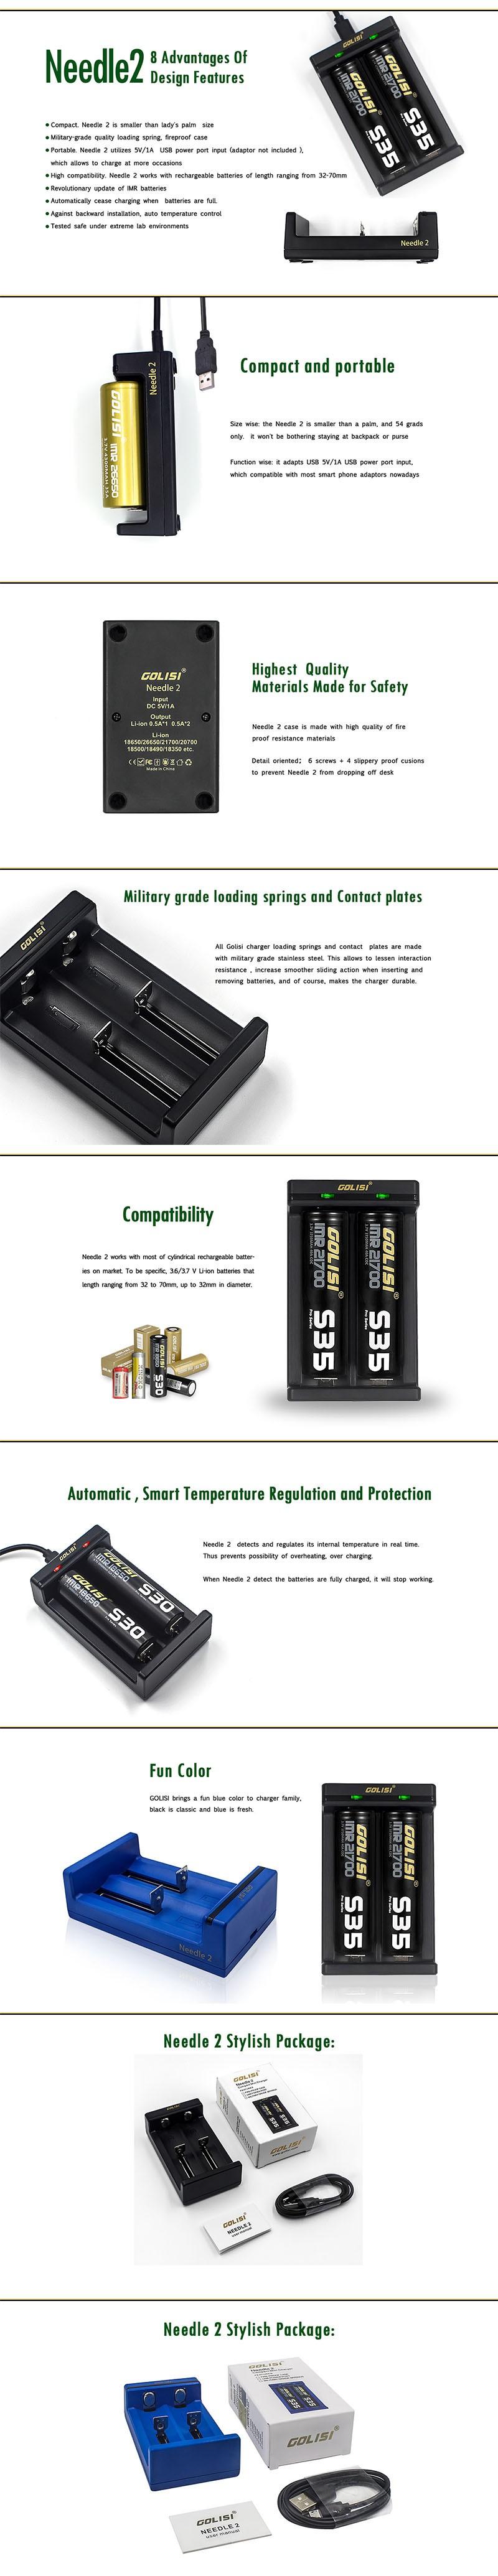 Golisi Needle 2 Smart USB Charger for Li-ion 18650 / 21700 / 26650 / Ni-Mh / Ni-Cd / AAA / AA Battery